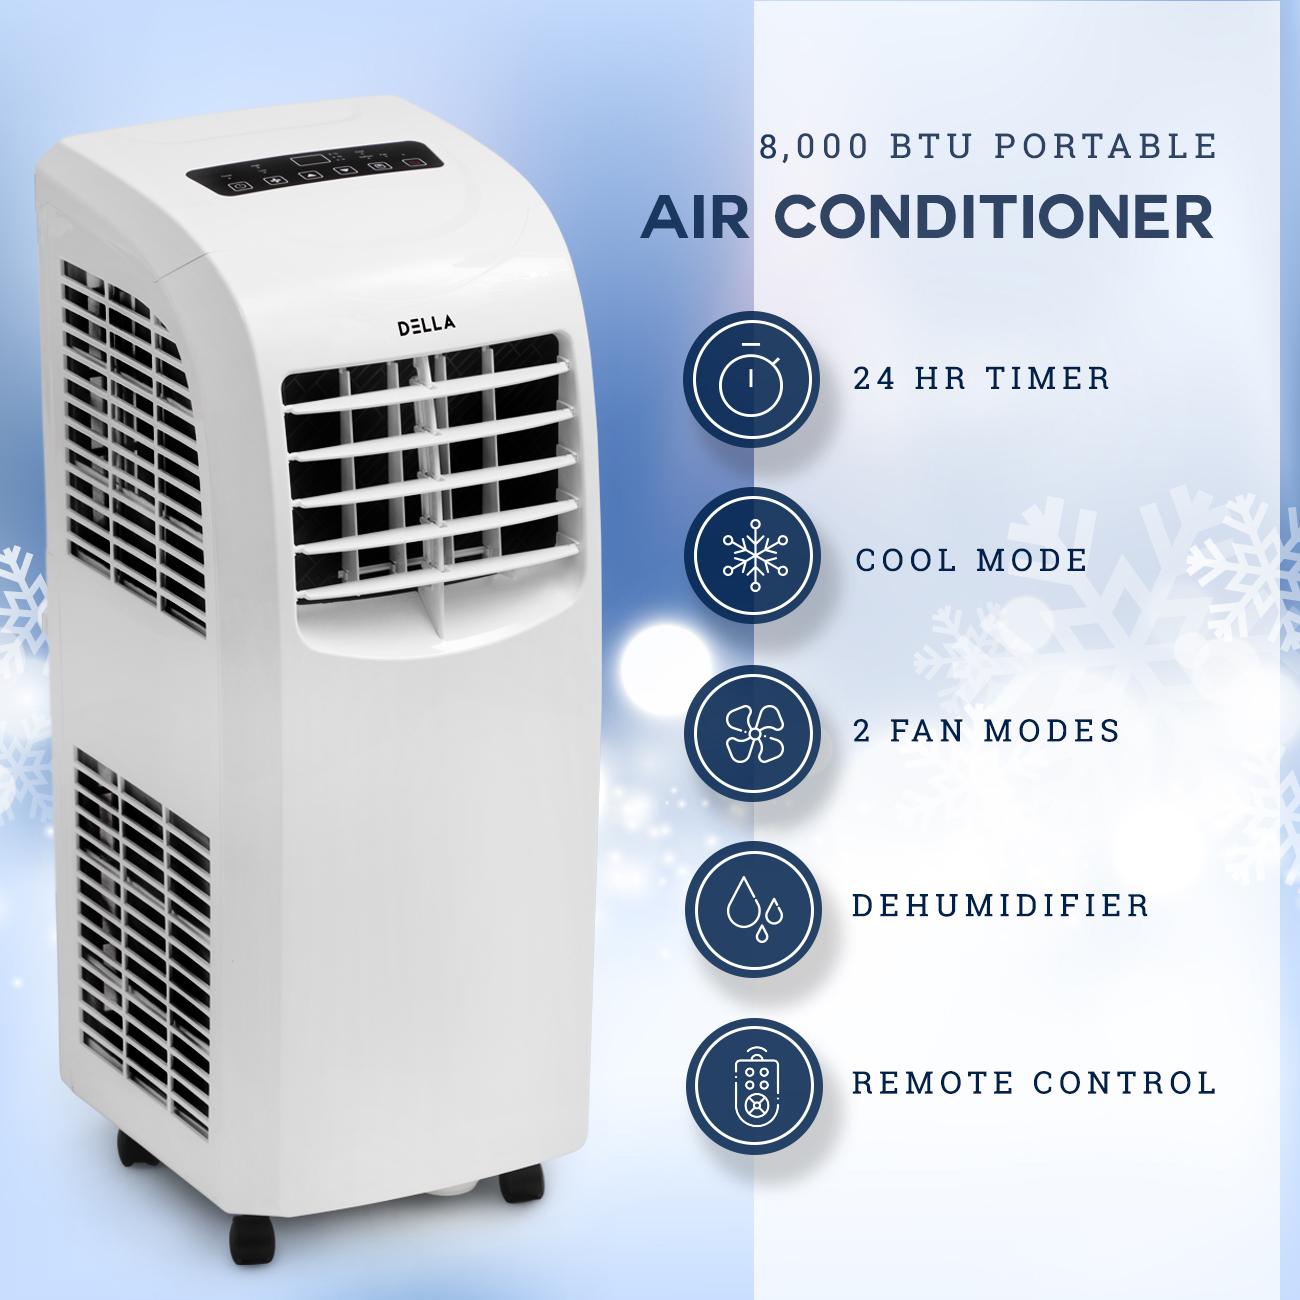 lg r410a portable air conditioner user manual